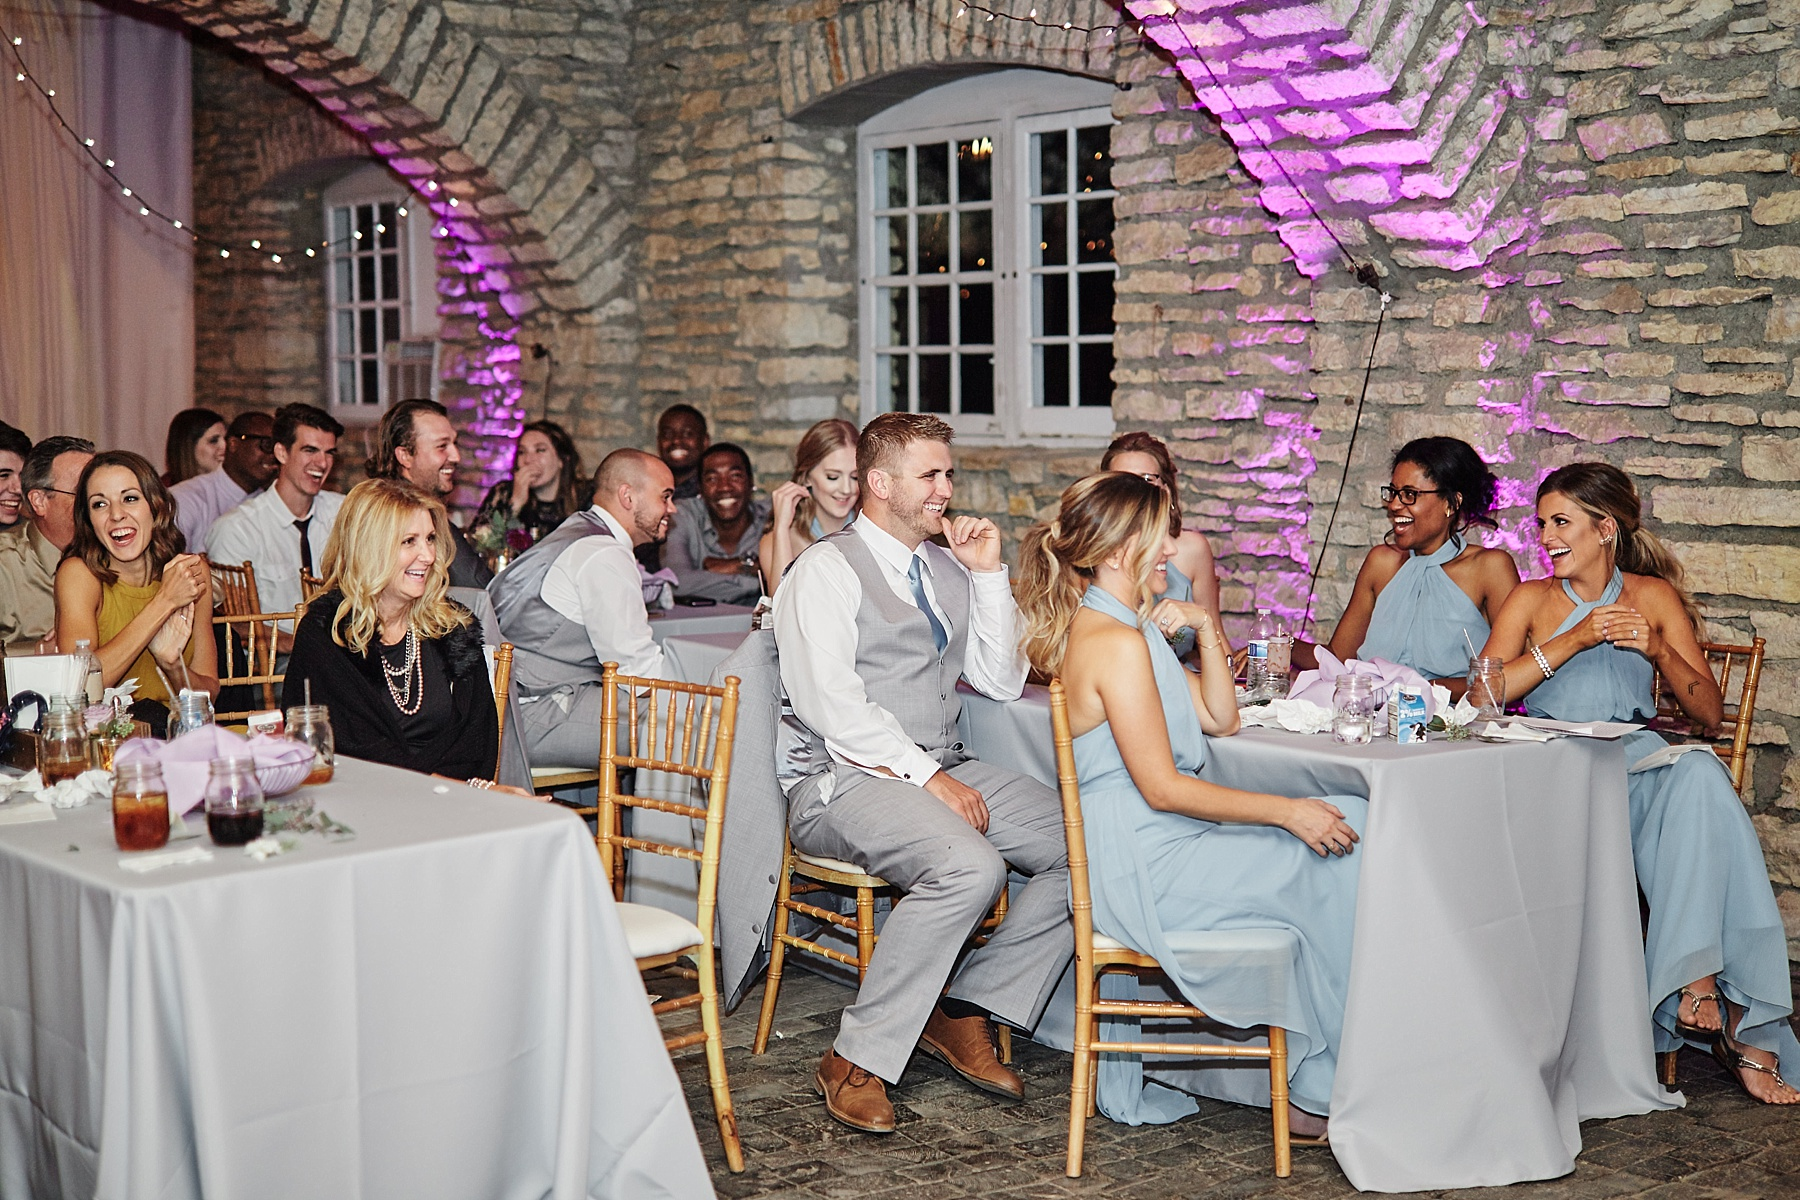 Maywood-Stone-Barn-Wedding-Rochester-Minnesota-Perry-James-Photo_0691.jpg